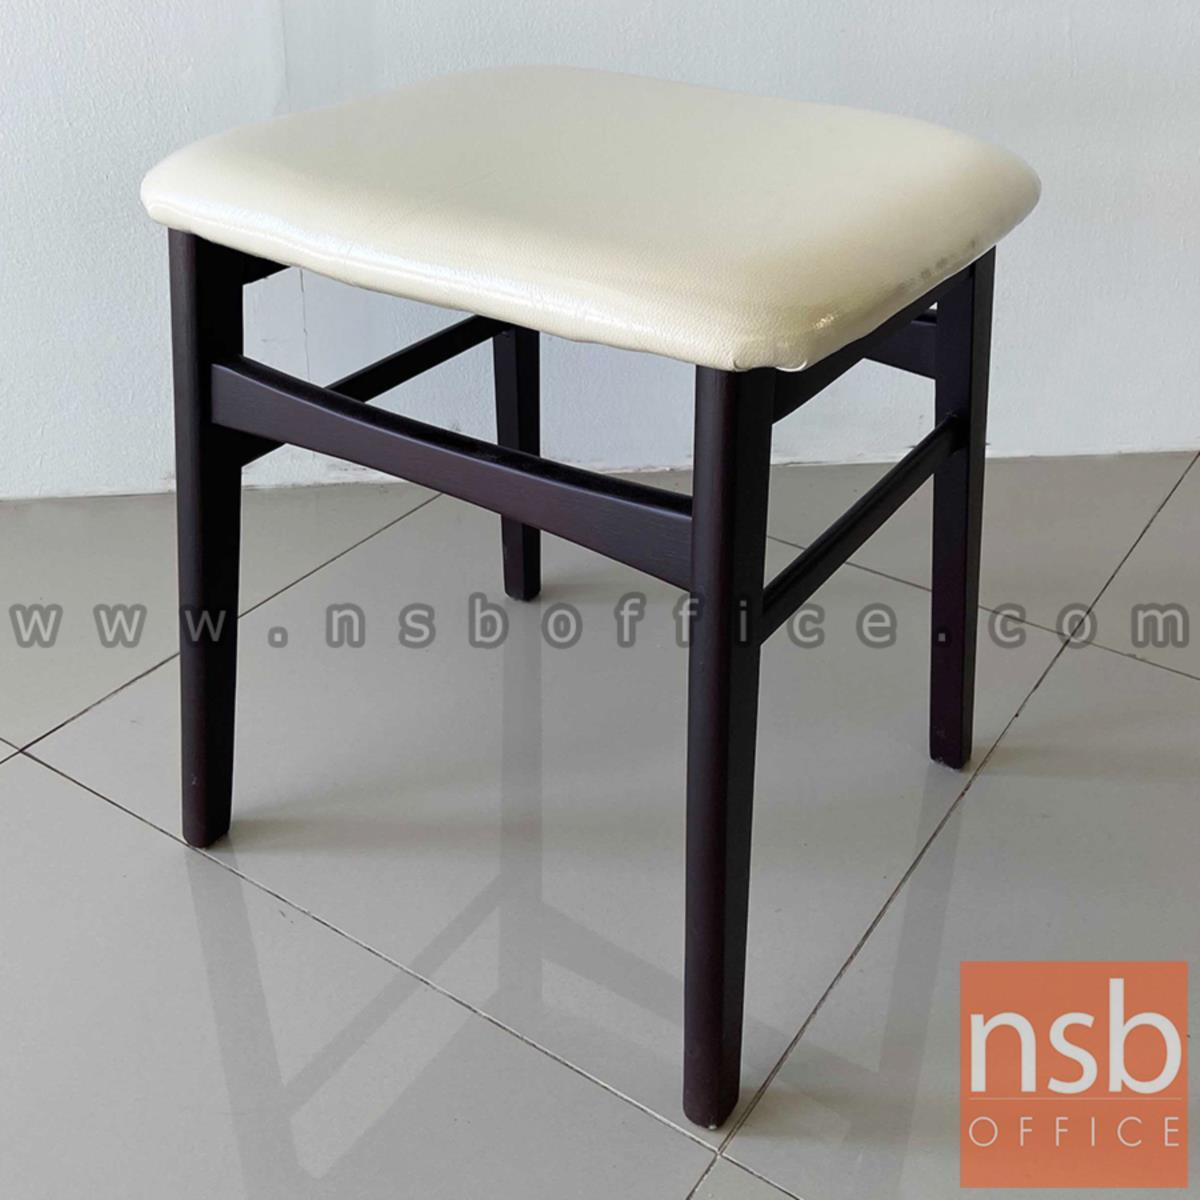 B09A226:เก้าอี้บาร์สตูลที่นั่งเหลี่ยม รุ่น Andrina (แอนดริน่า)  โครงไม้